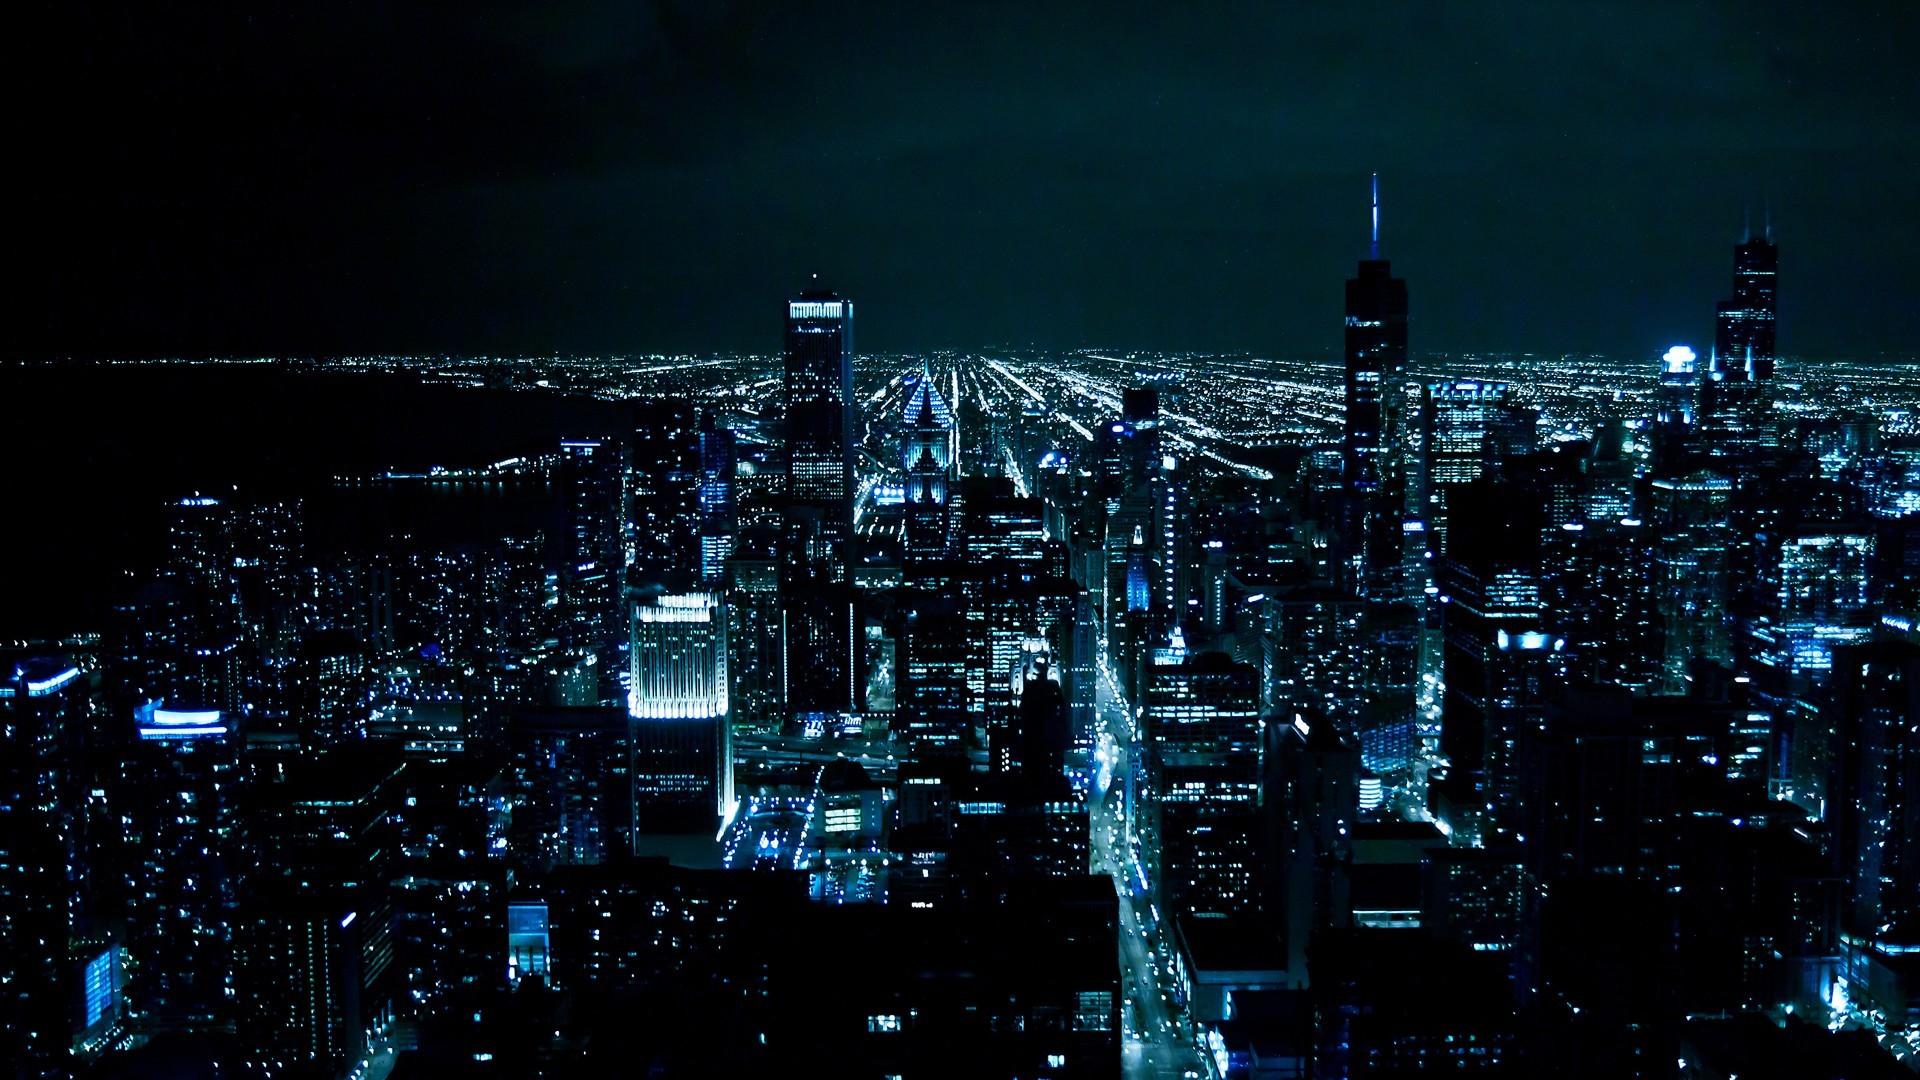 Gotham City Hd Wallpaper 64 Images